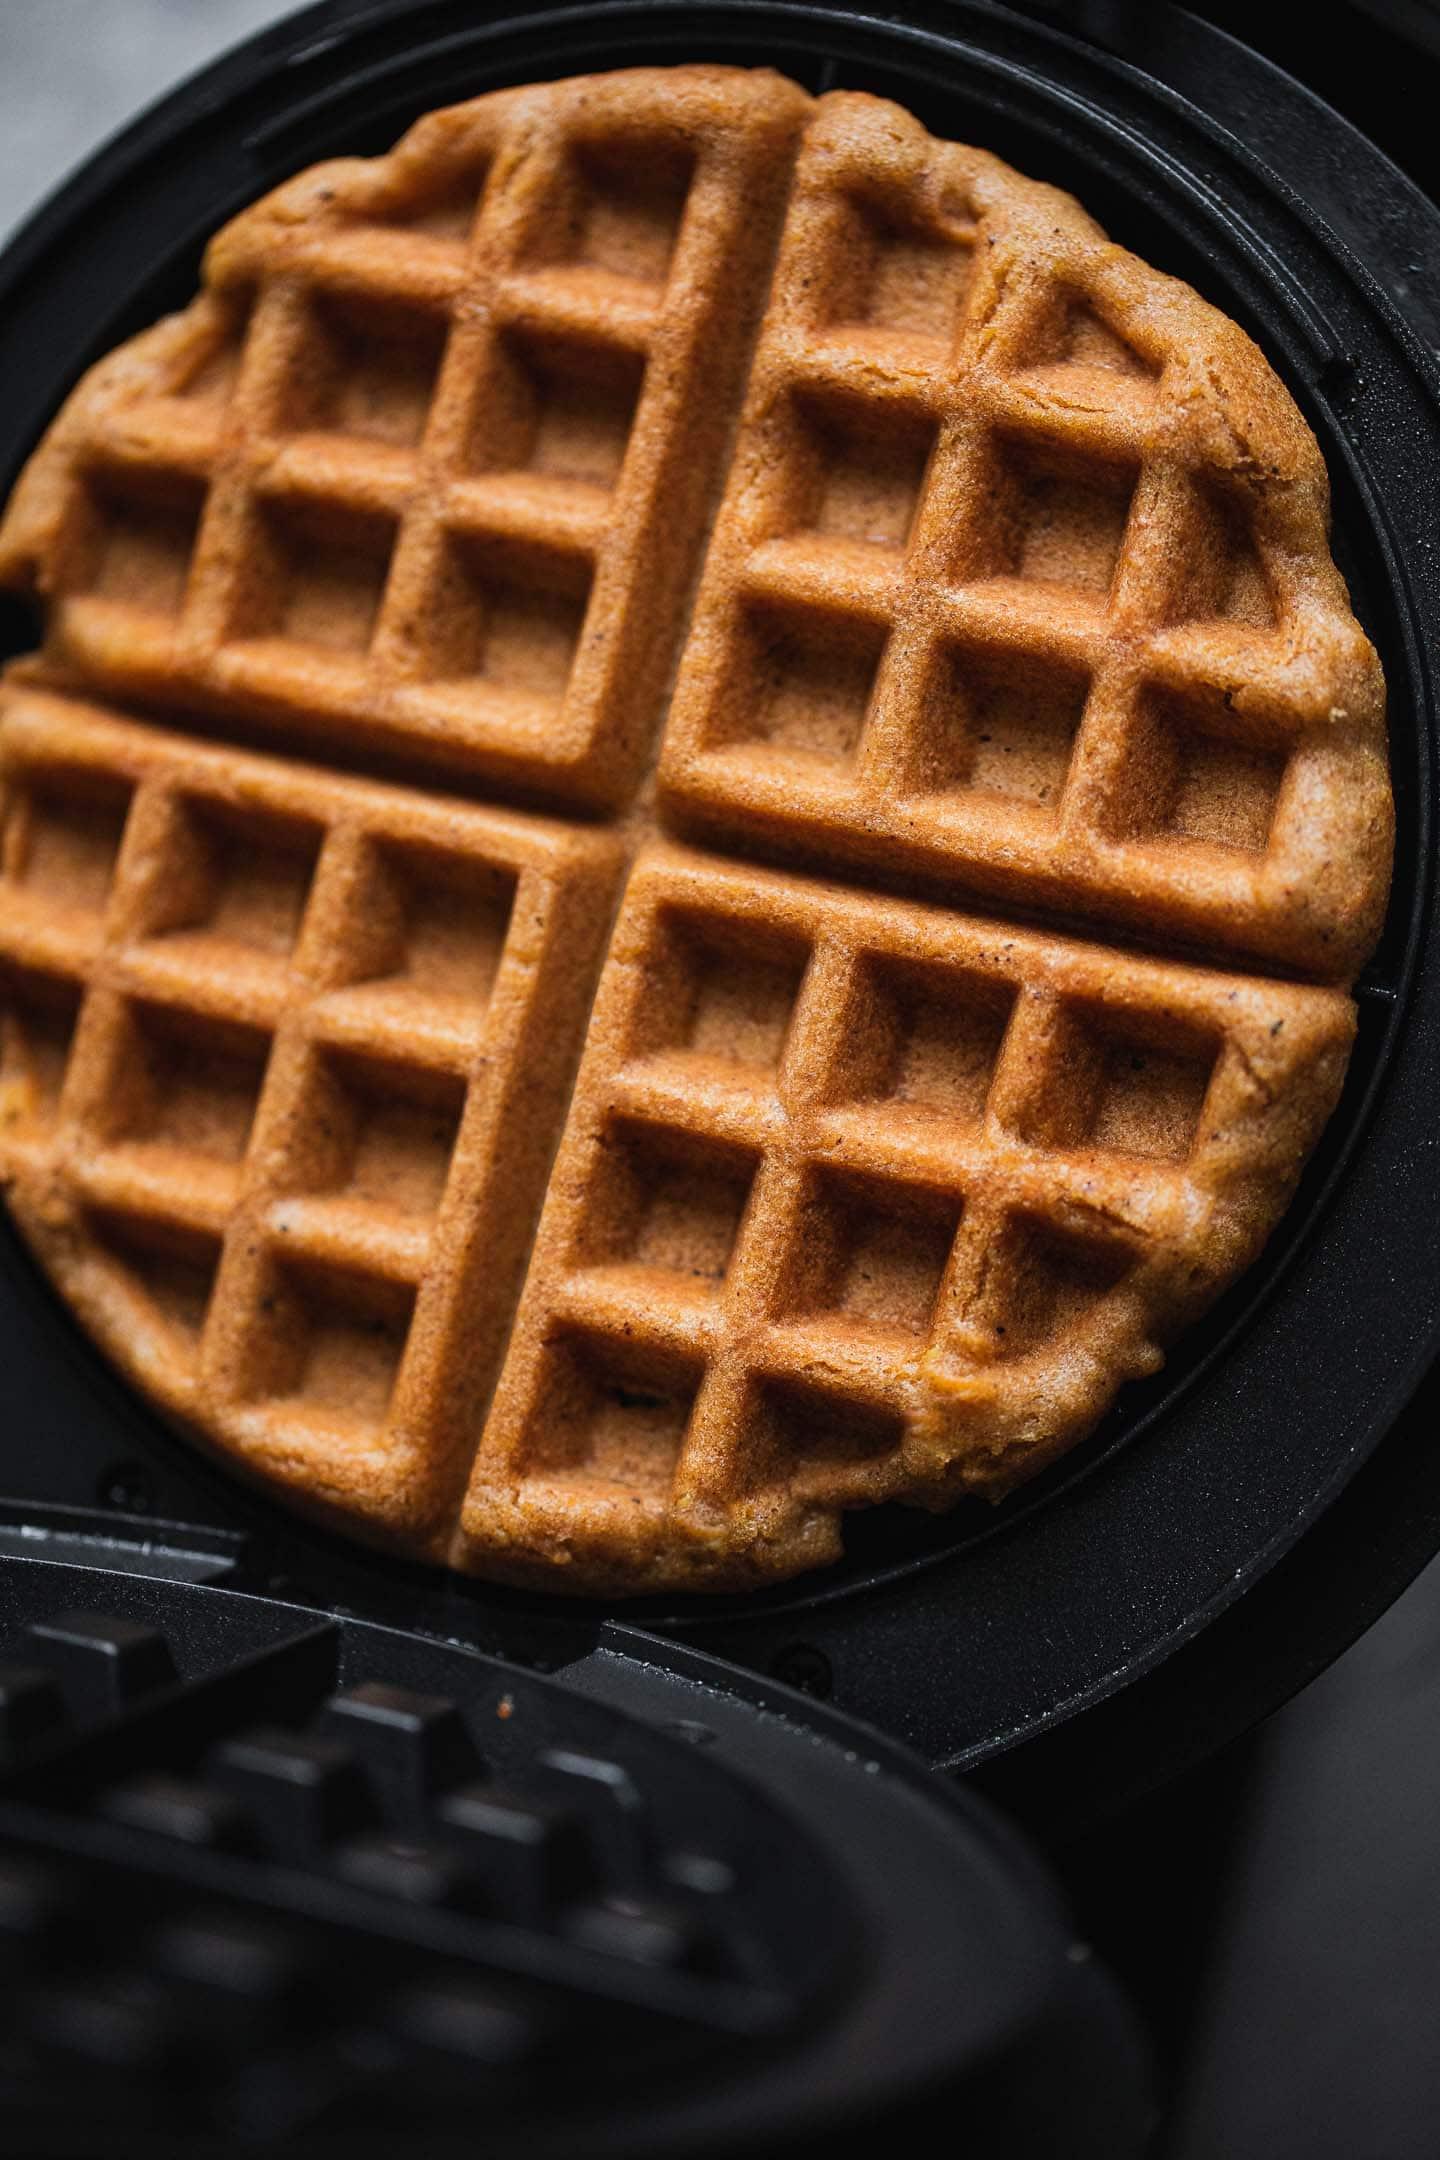 Vegan waffle in a waffle iron